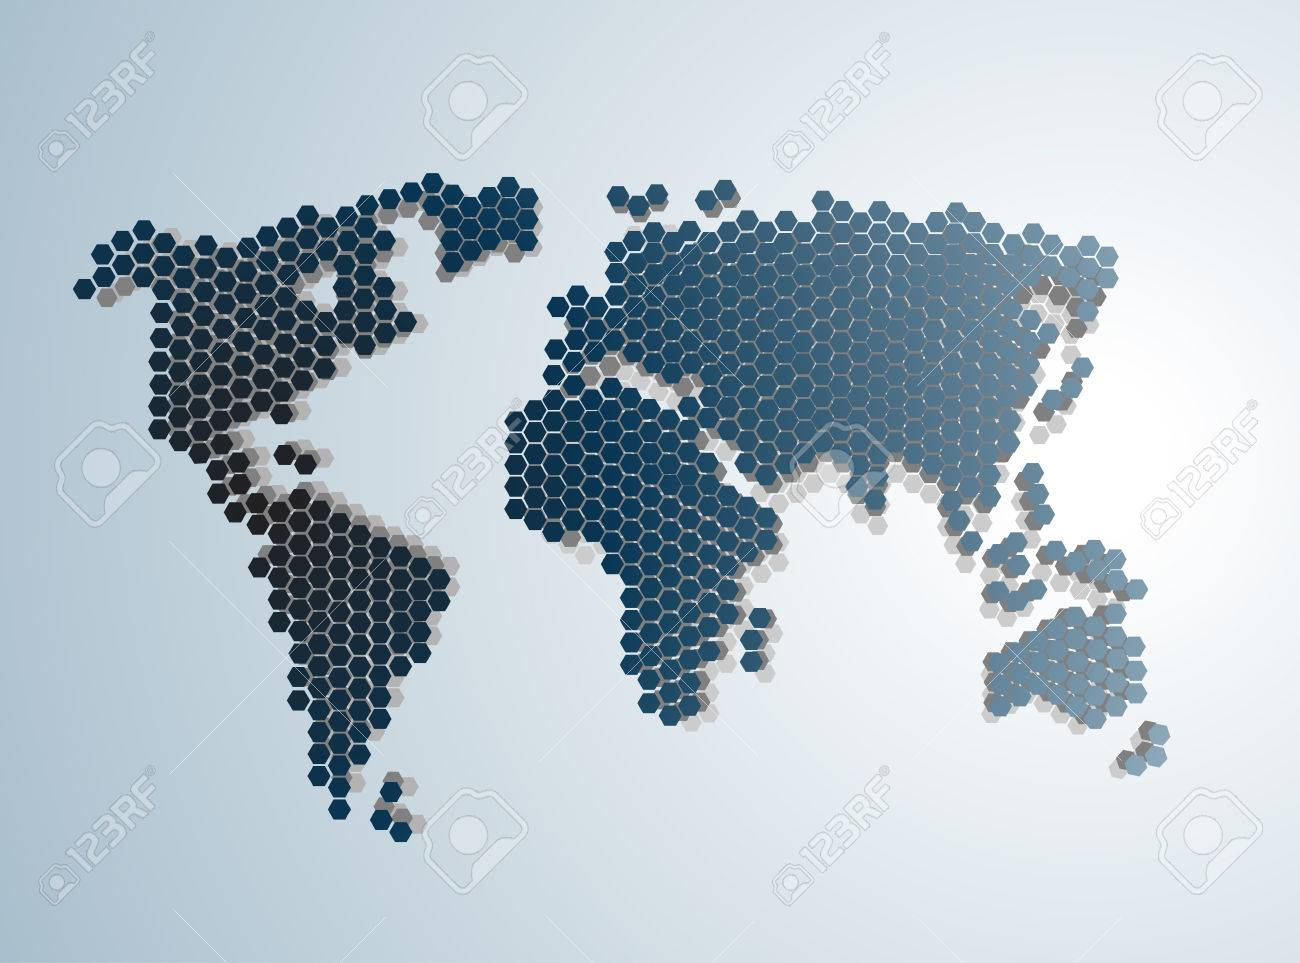 Digital Abstract Modern World Map Vector Illustration Royalty - Modern world map